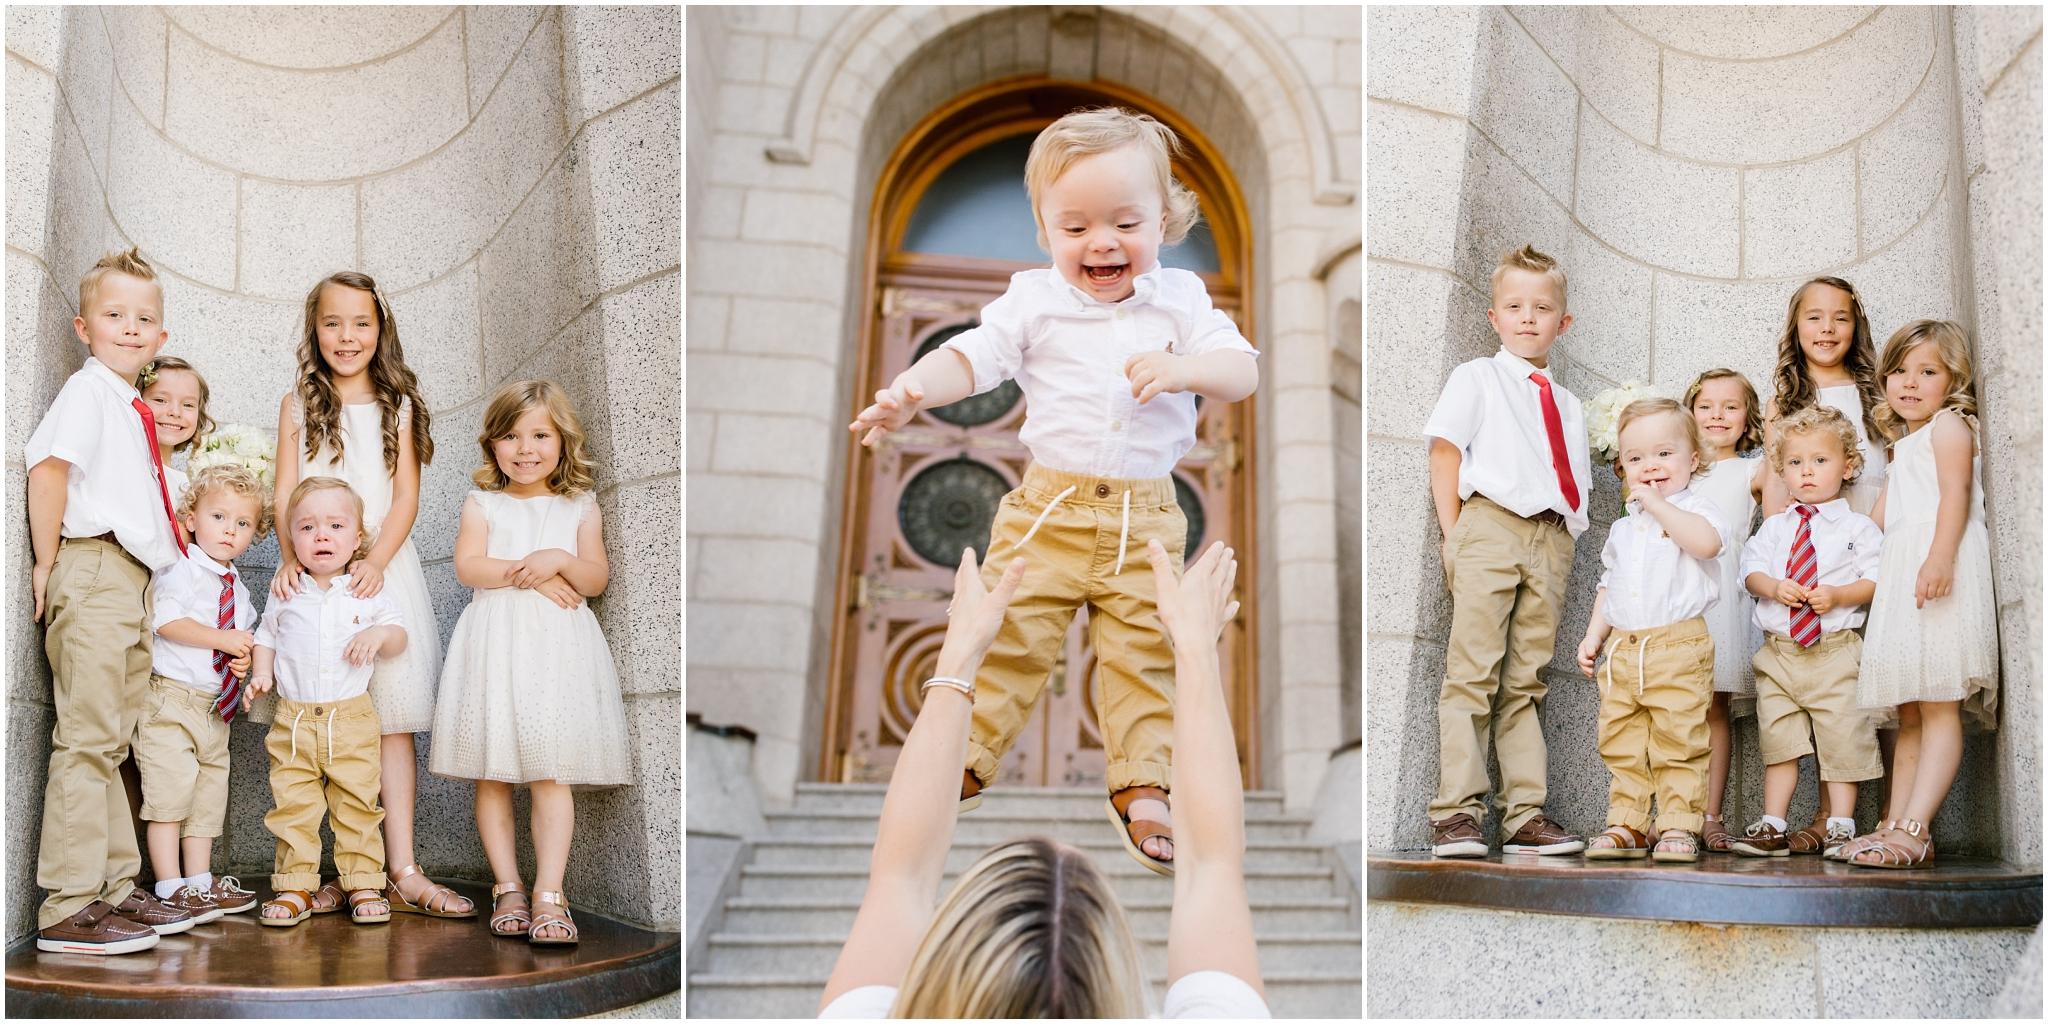 CherylandTyler-128_Lizzie-B-Imagery-Utah-Wedding-Photographer-Salt-Lake-City-Temple-Wells-Fargo-Building-Reception.jpg